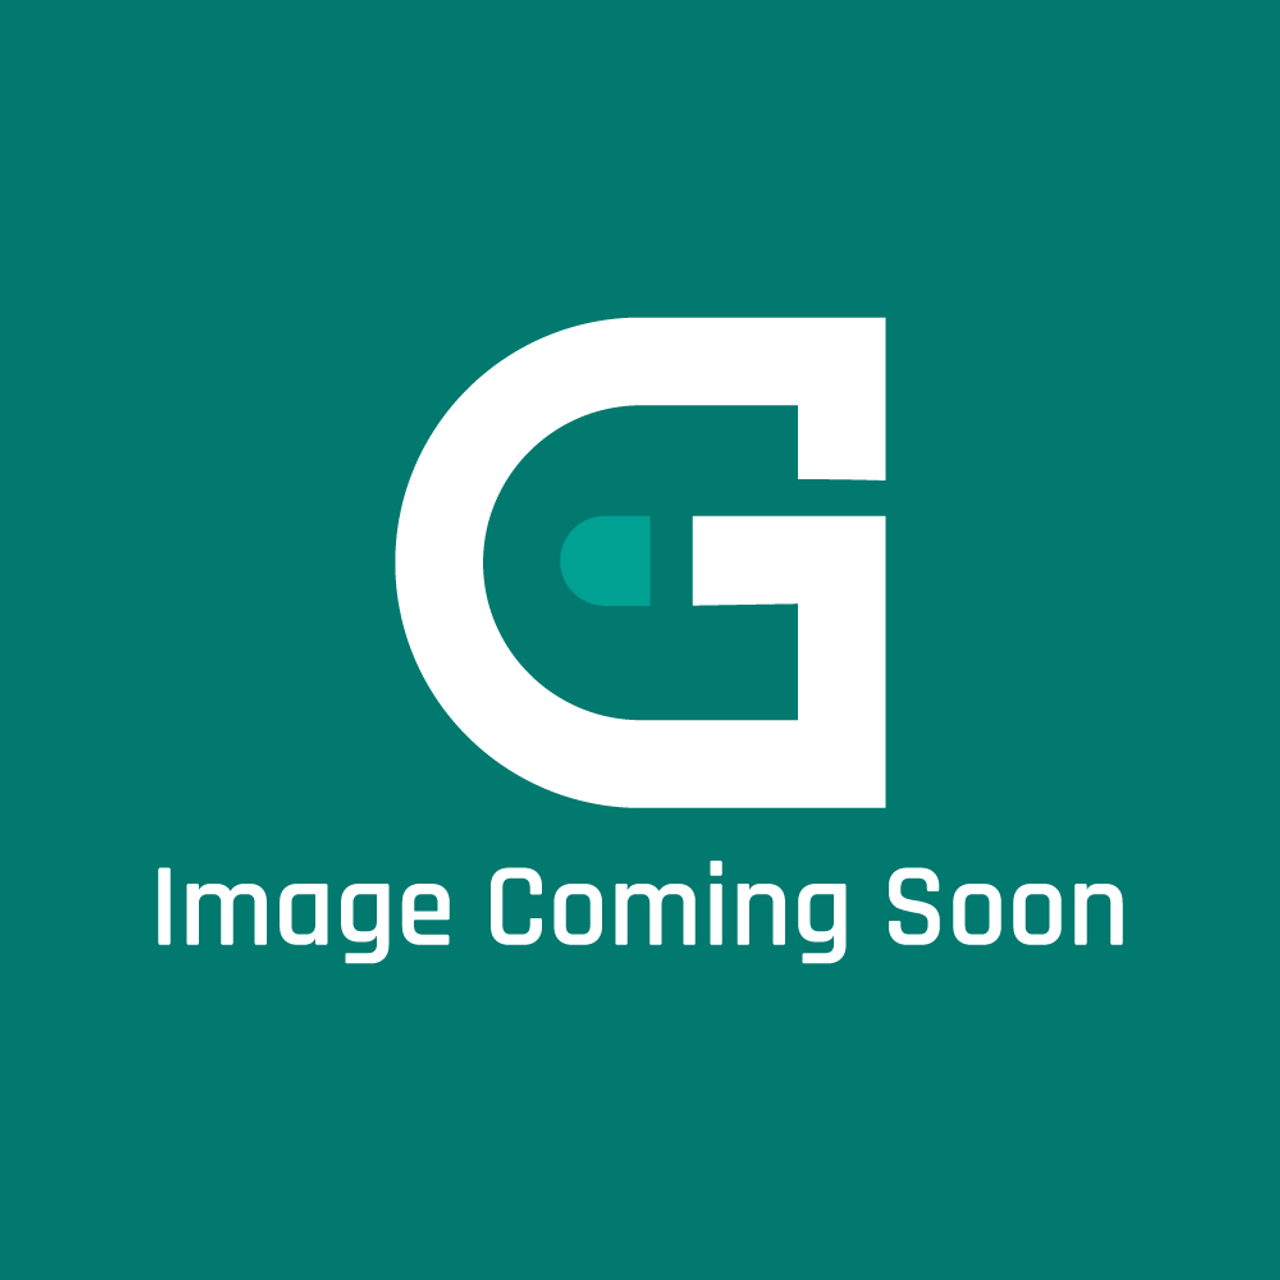 "Viking G4006378 - WIRE ASSY (VGBQ-T SERIES) 25"" - Image Coming Soon!"